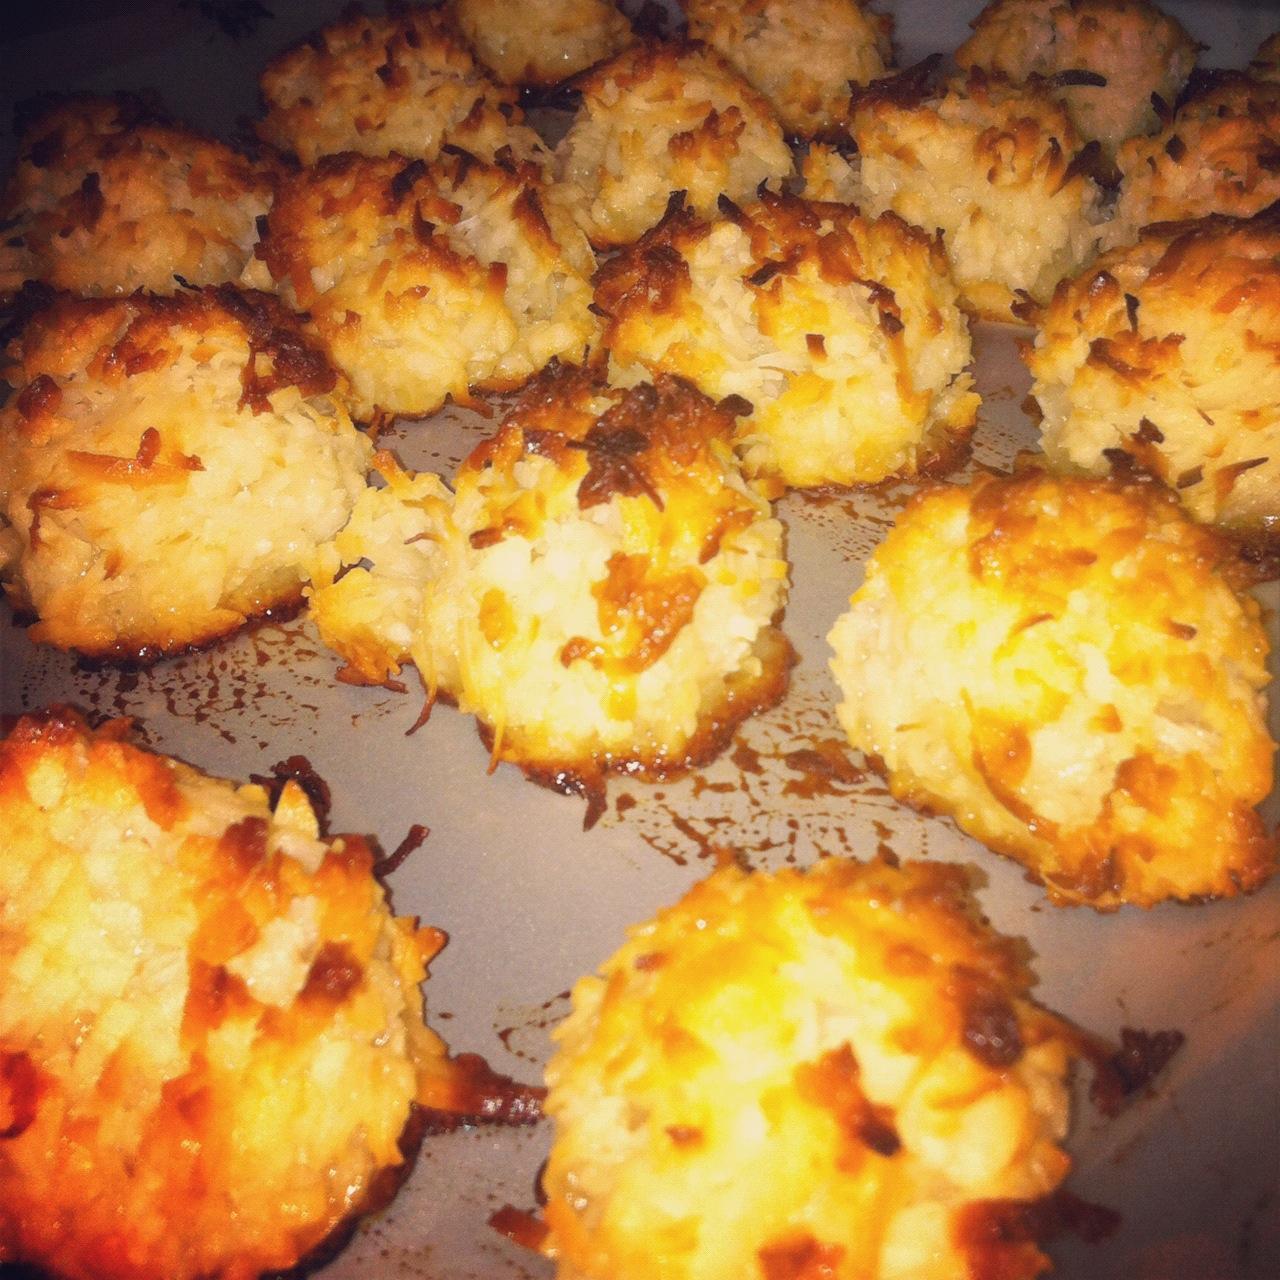 ... Yakkin': Let Them Eat Coconut! Gluten-Free, Paleo Coconut Macaroons